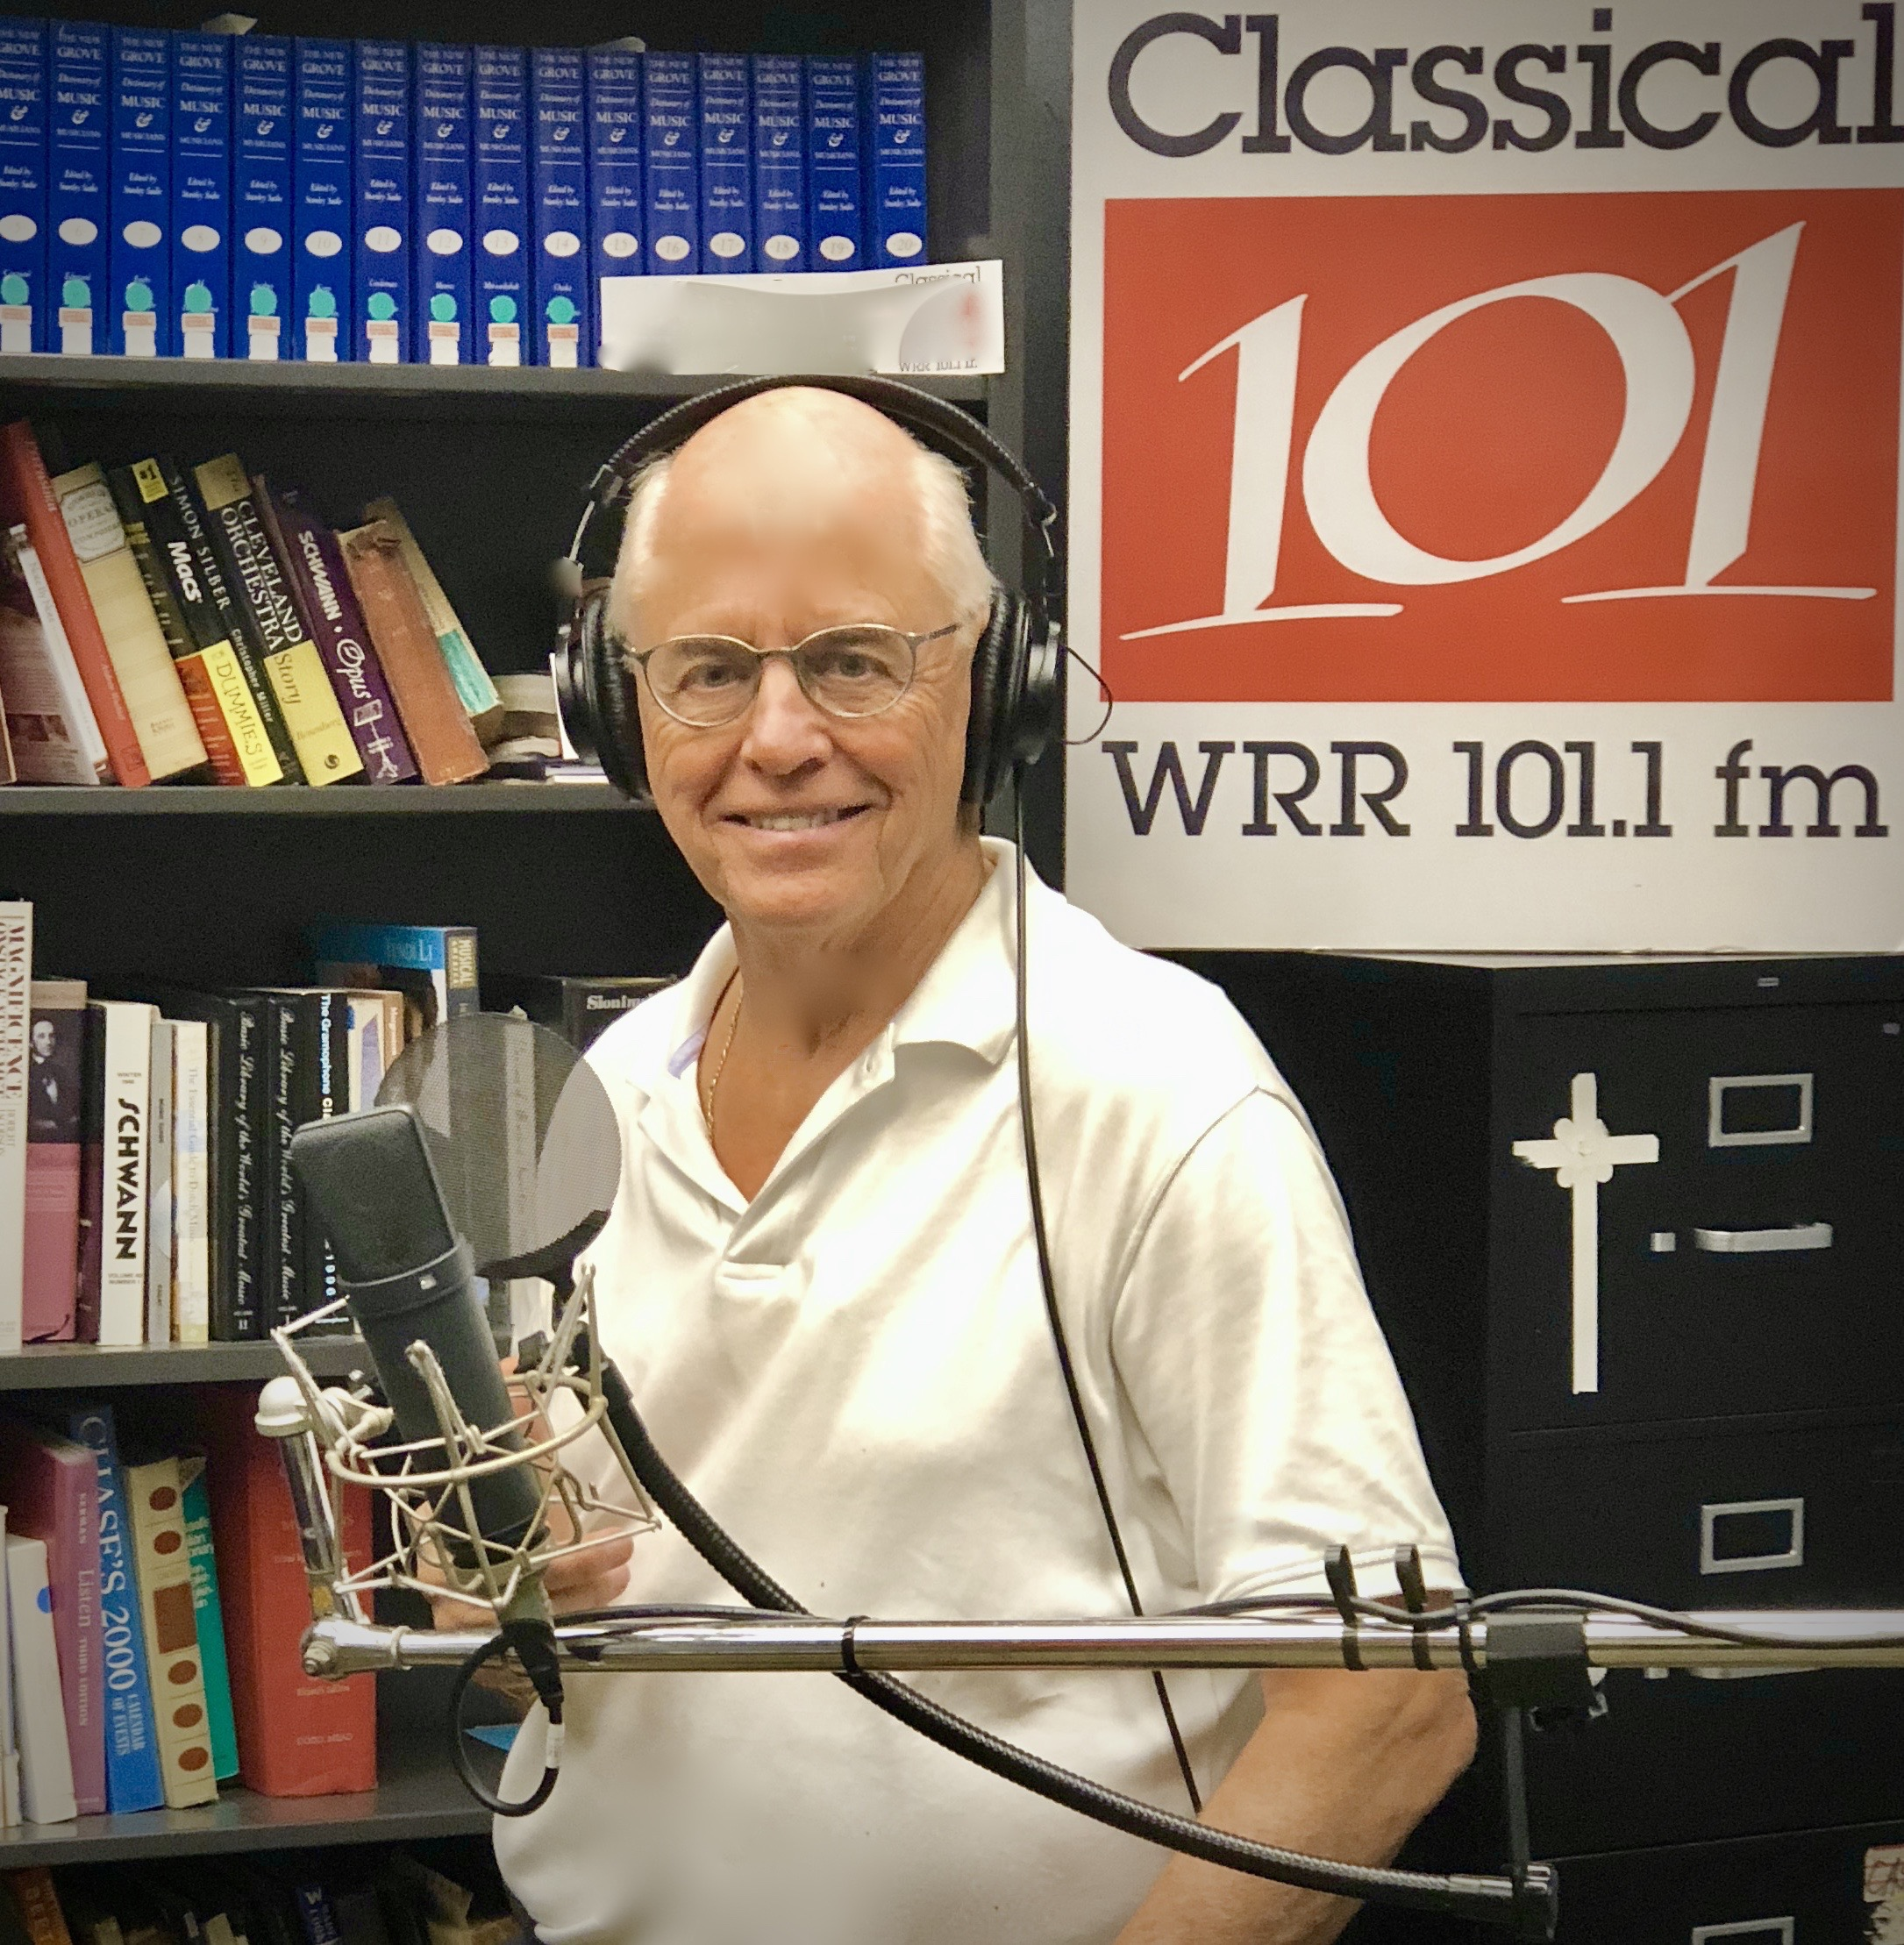 Don-radio station photo.jpg